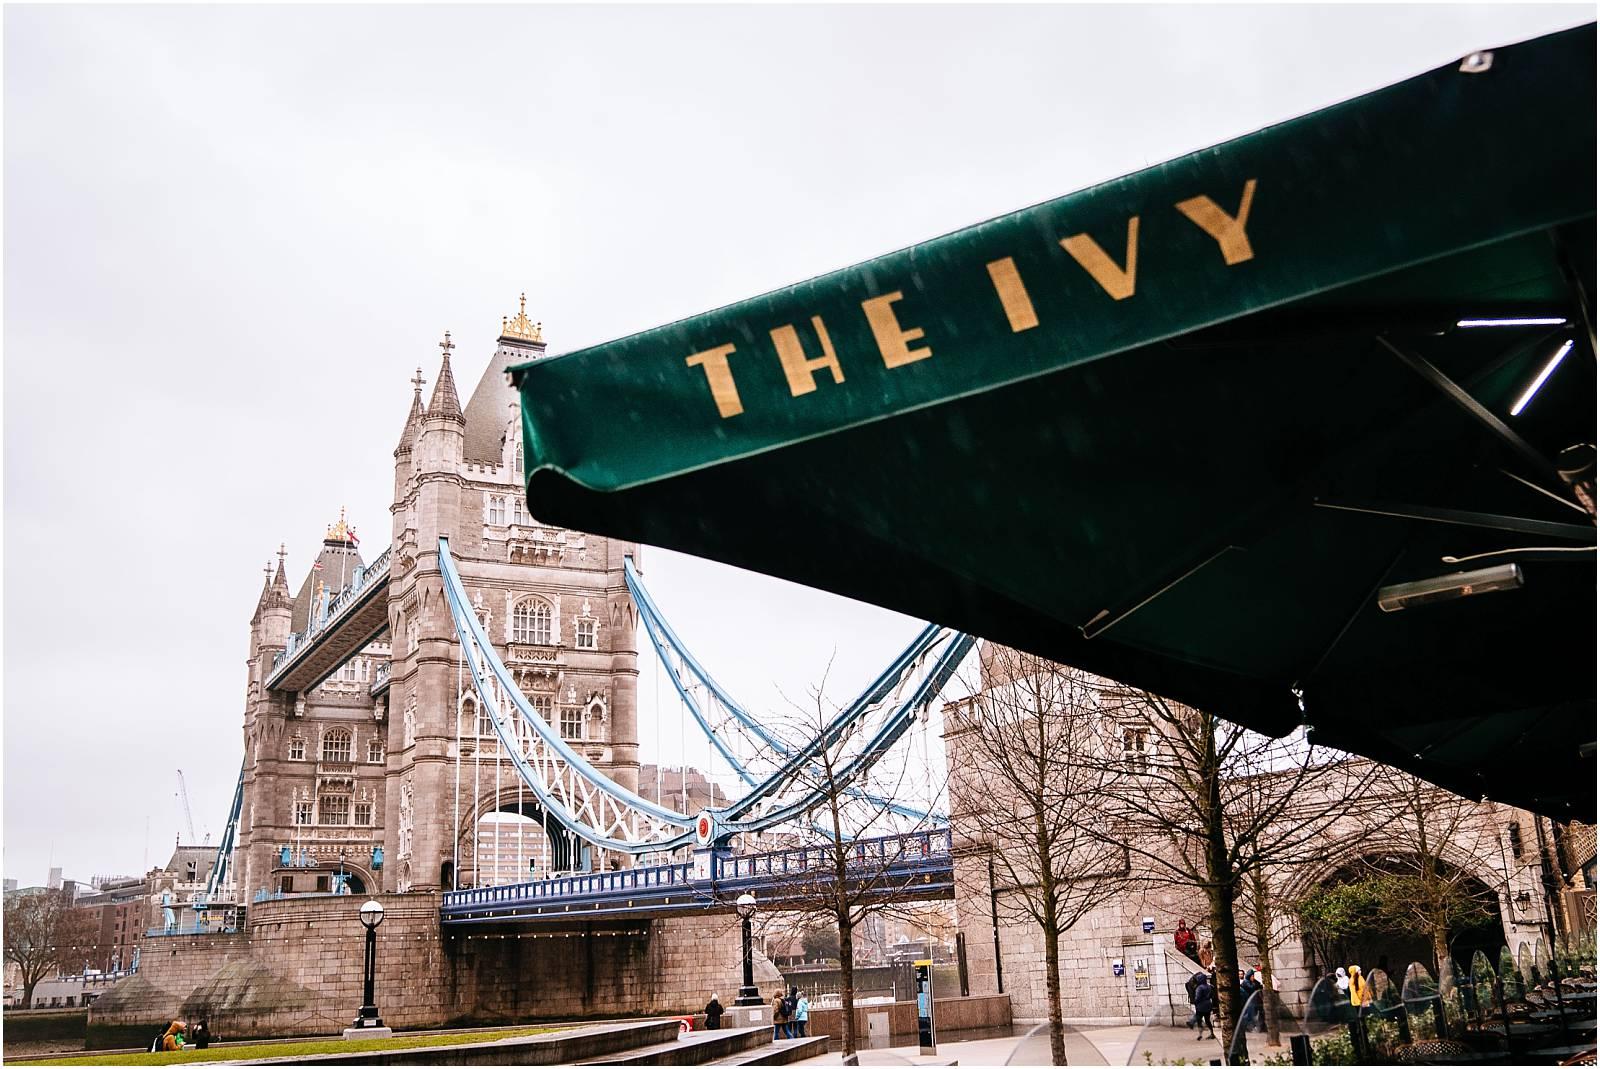 the ivy tower bridge